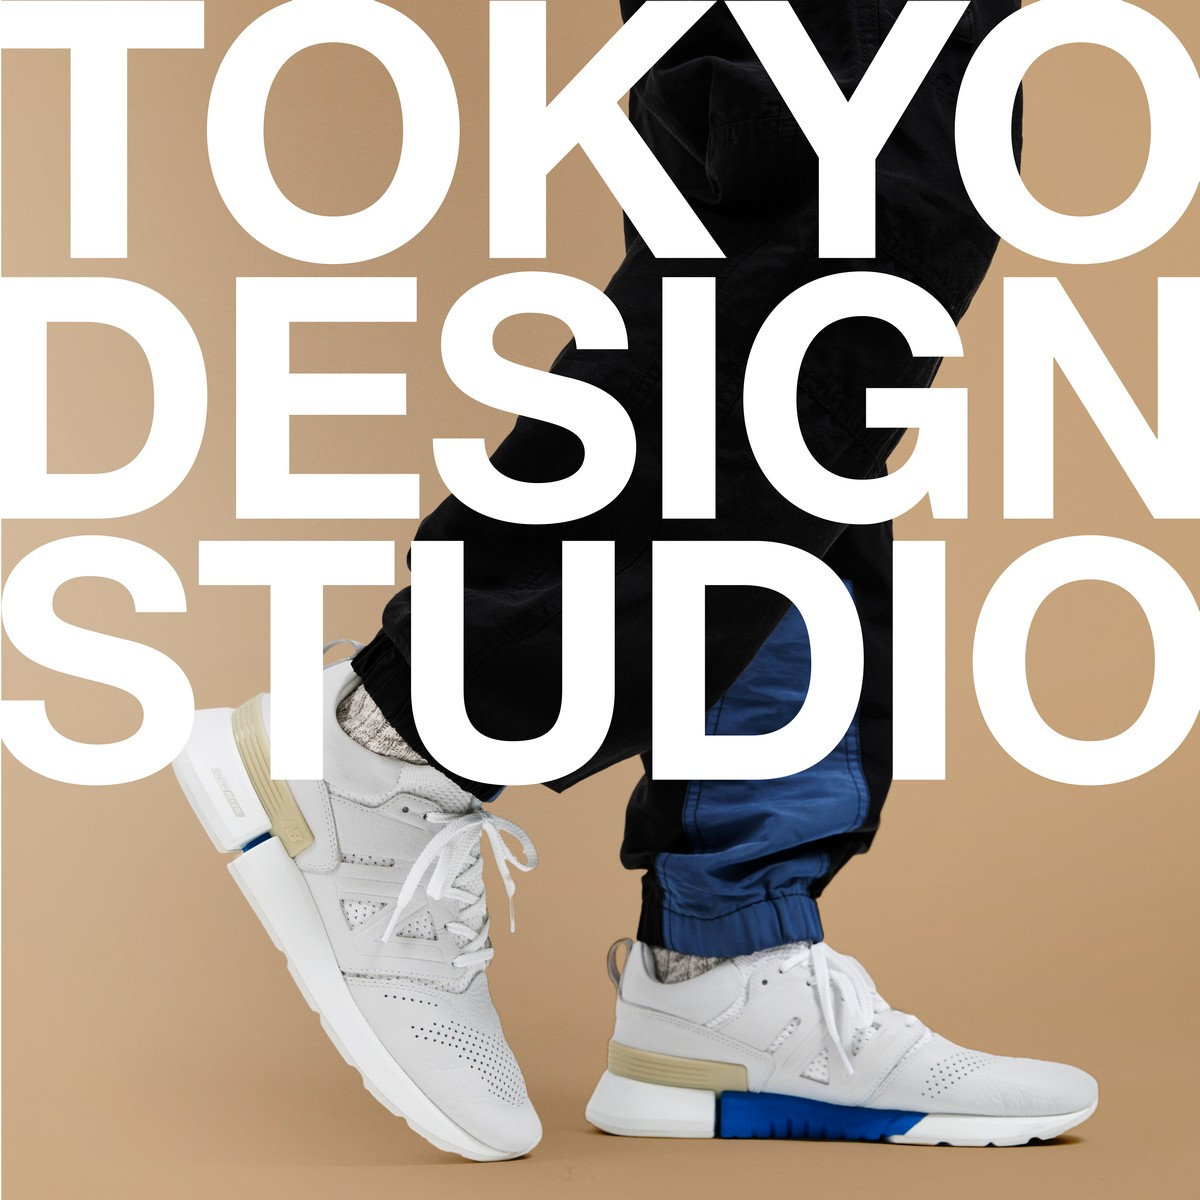 New Balance Tokyo Design Studio MSRC1